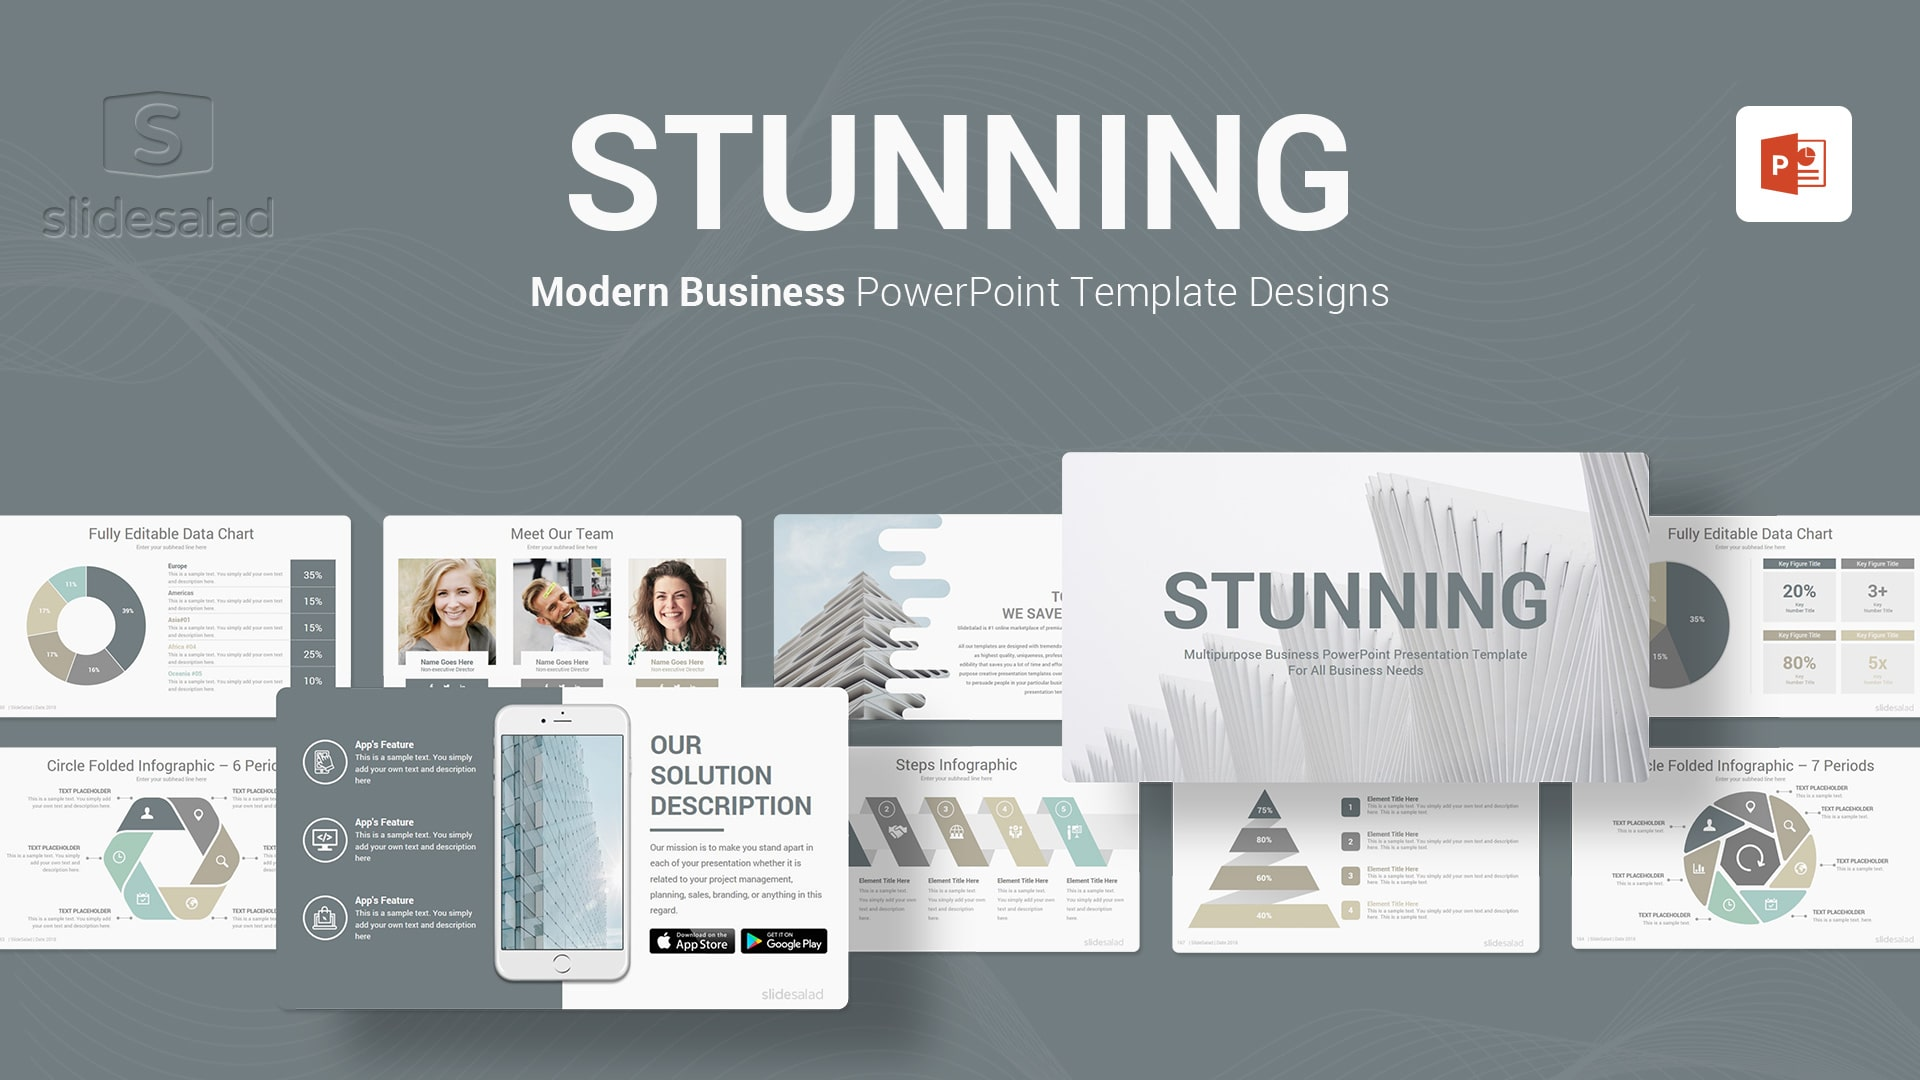 Stunning PowerPoint Template Multipurpose Designs - Vivid Customizable PowerPoint Presentation Template